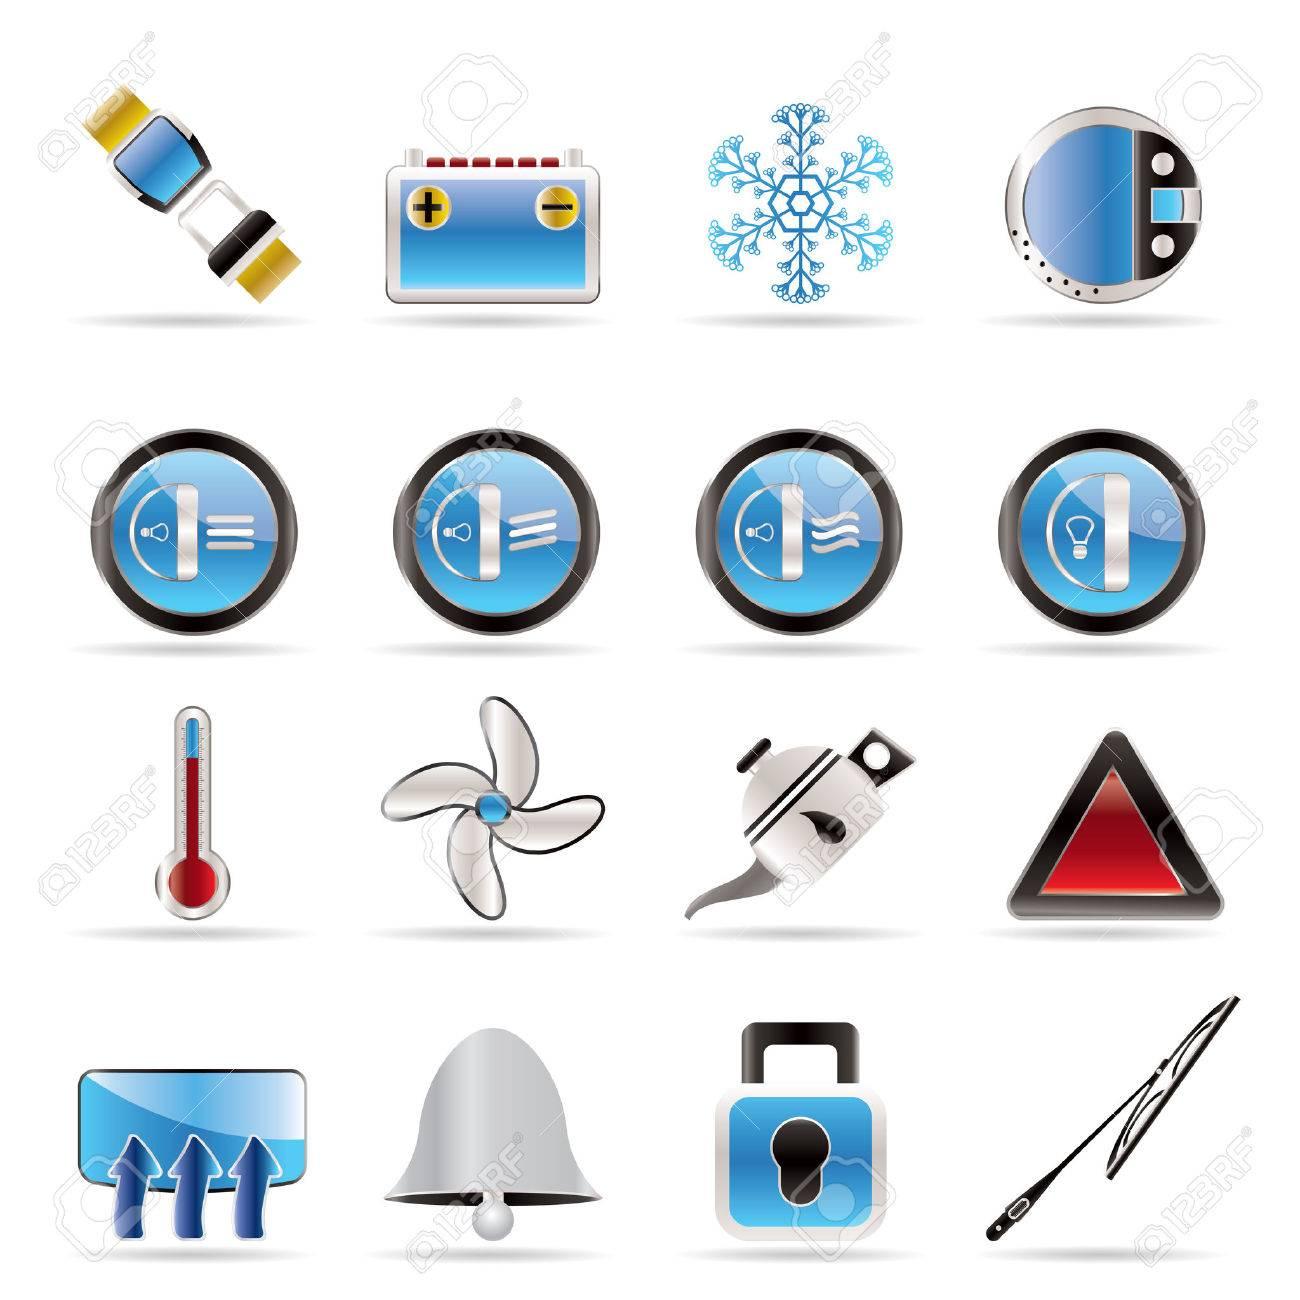 Car Dashboard - realistic vector icons set Stock Vector - 5915415